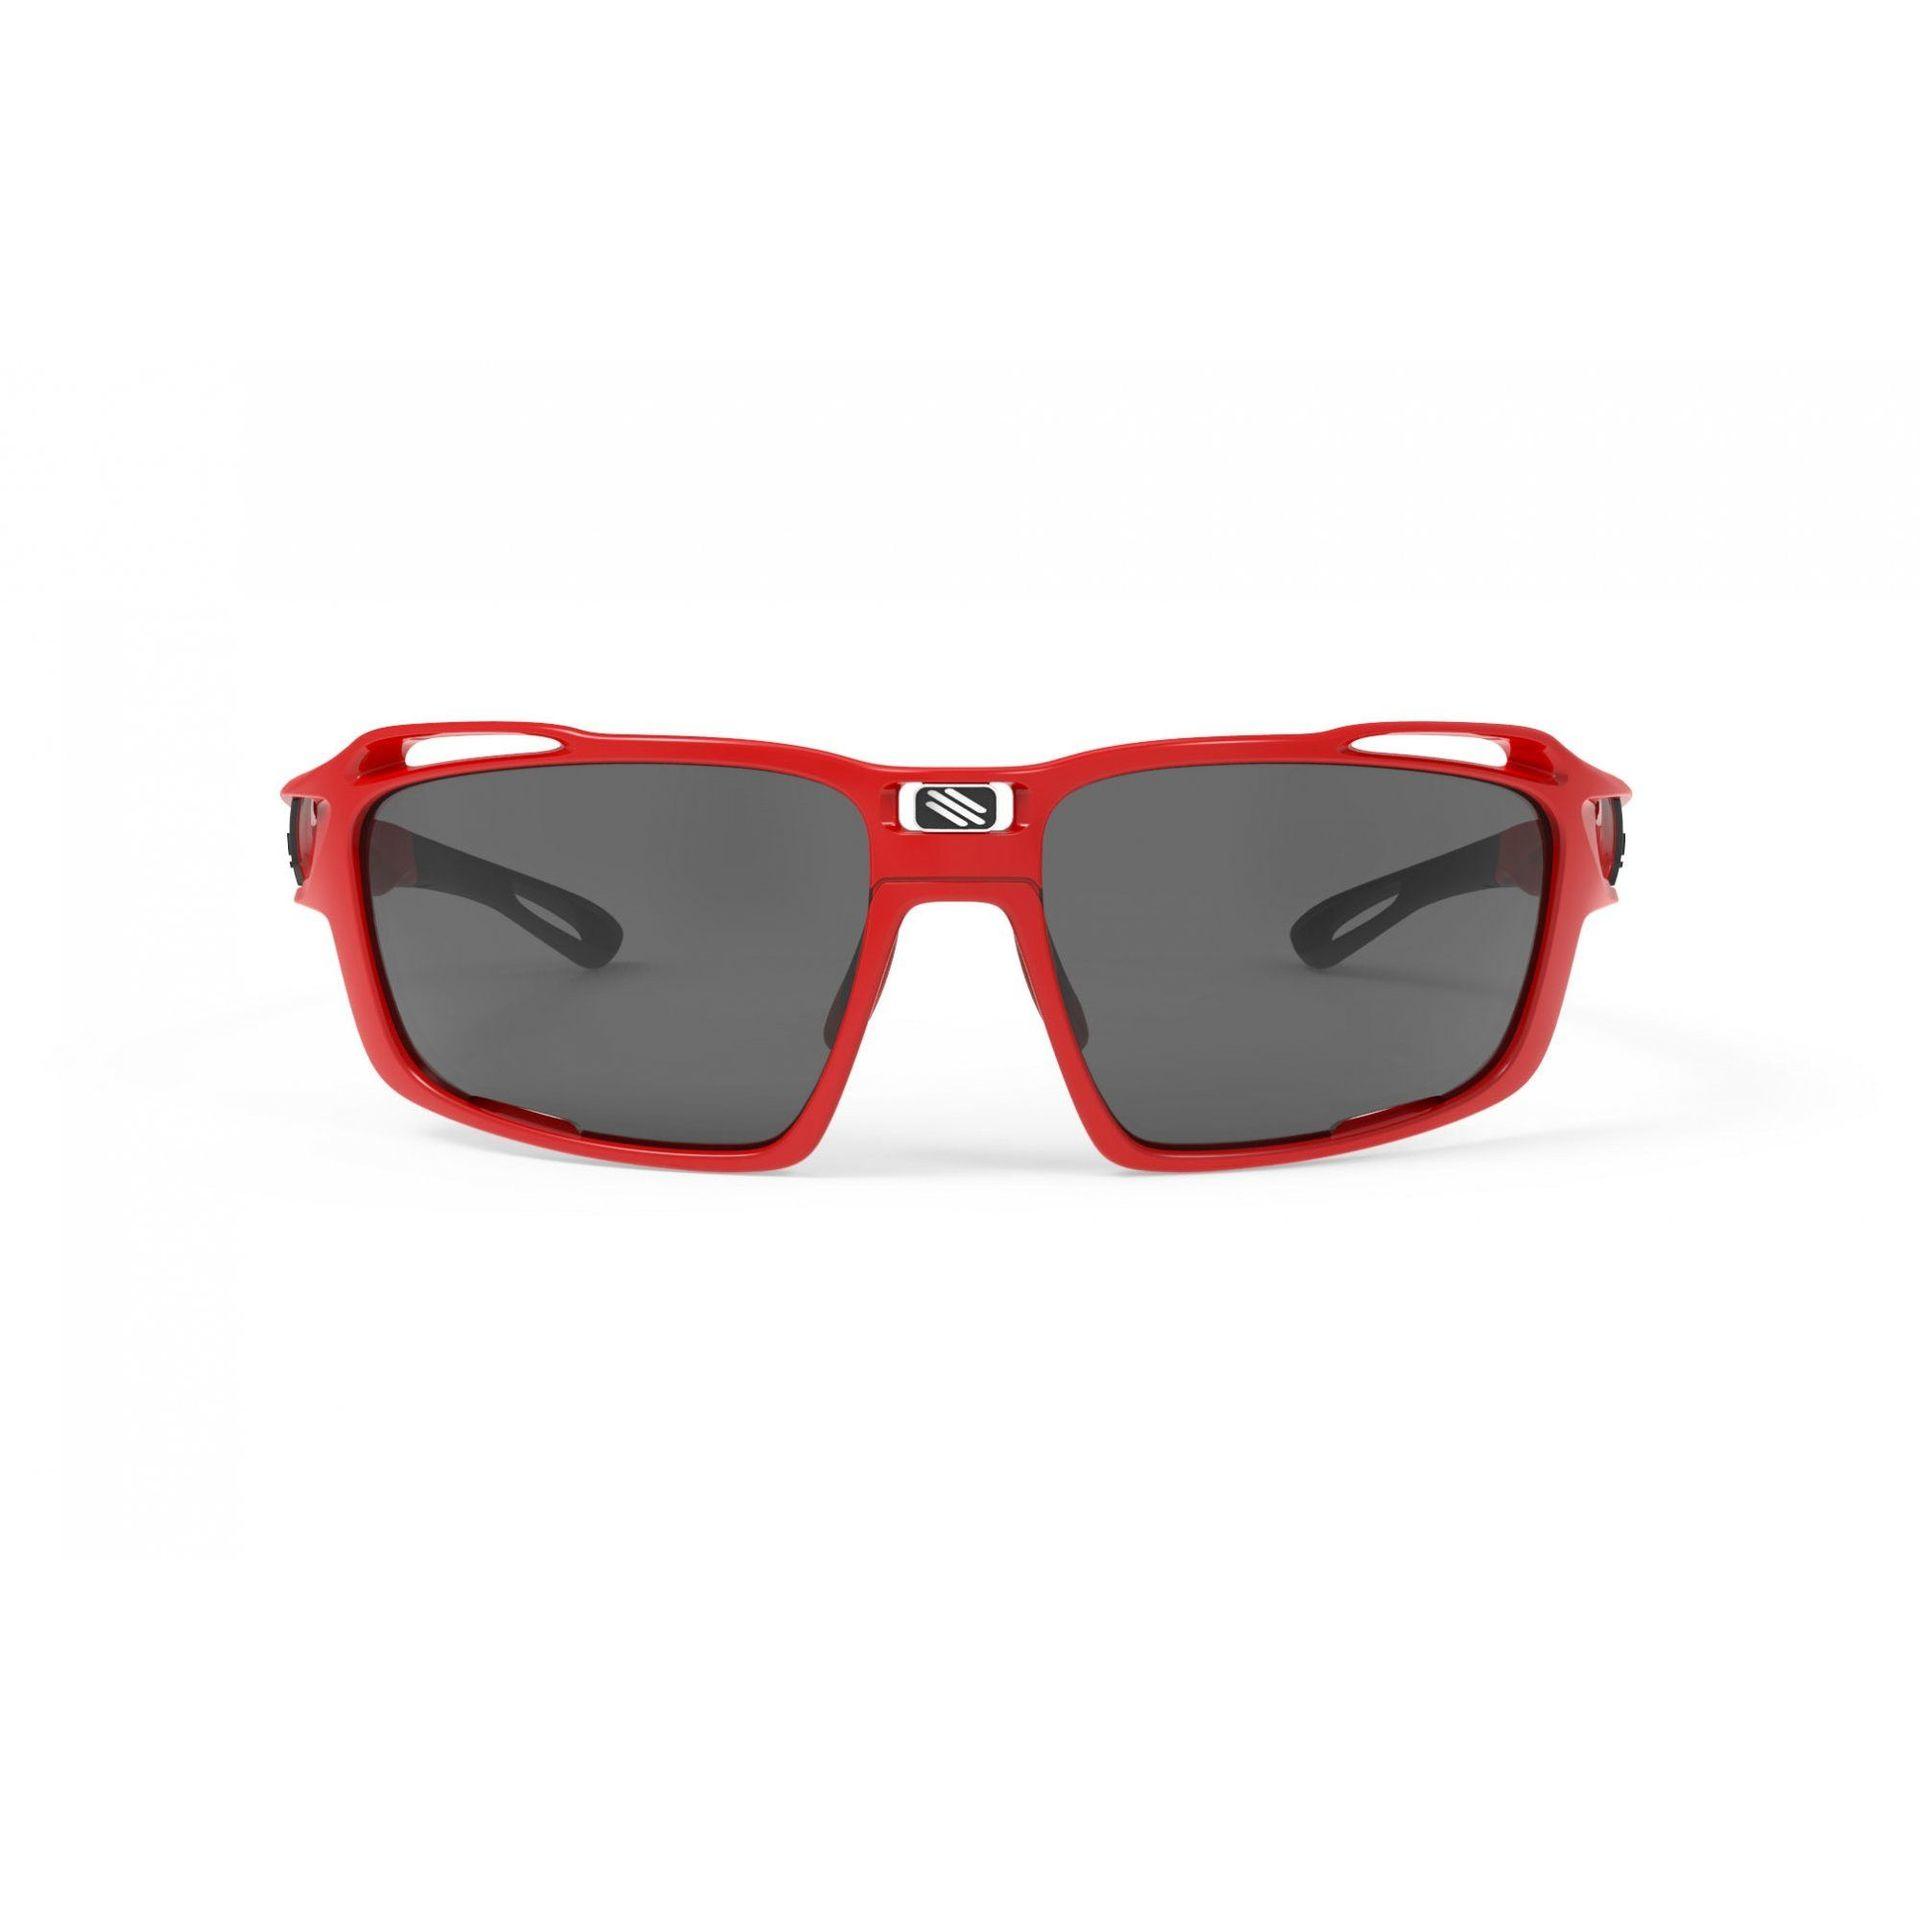 OKULARY RUDY PROJECT SINTRYX FIRE RED + SMOKE|TRANS SP491045 2